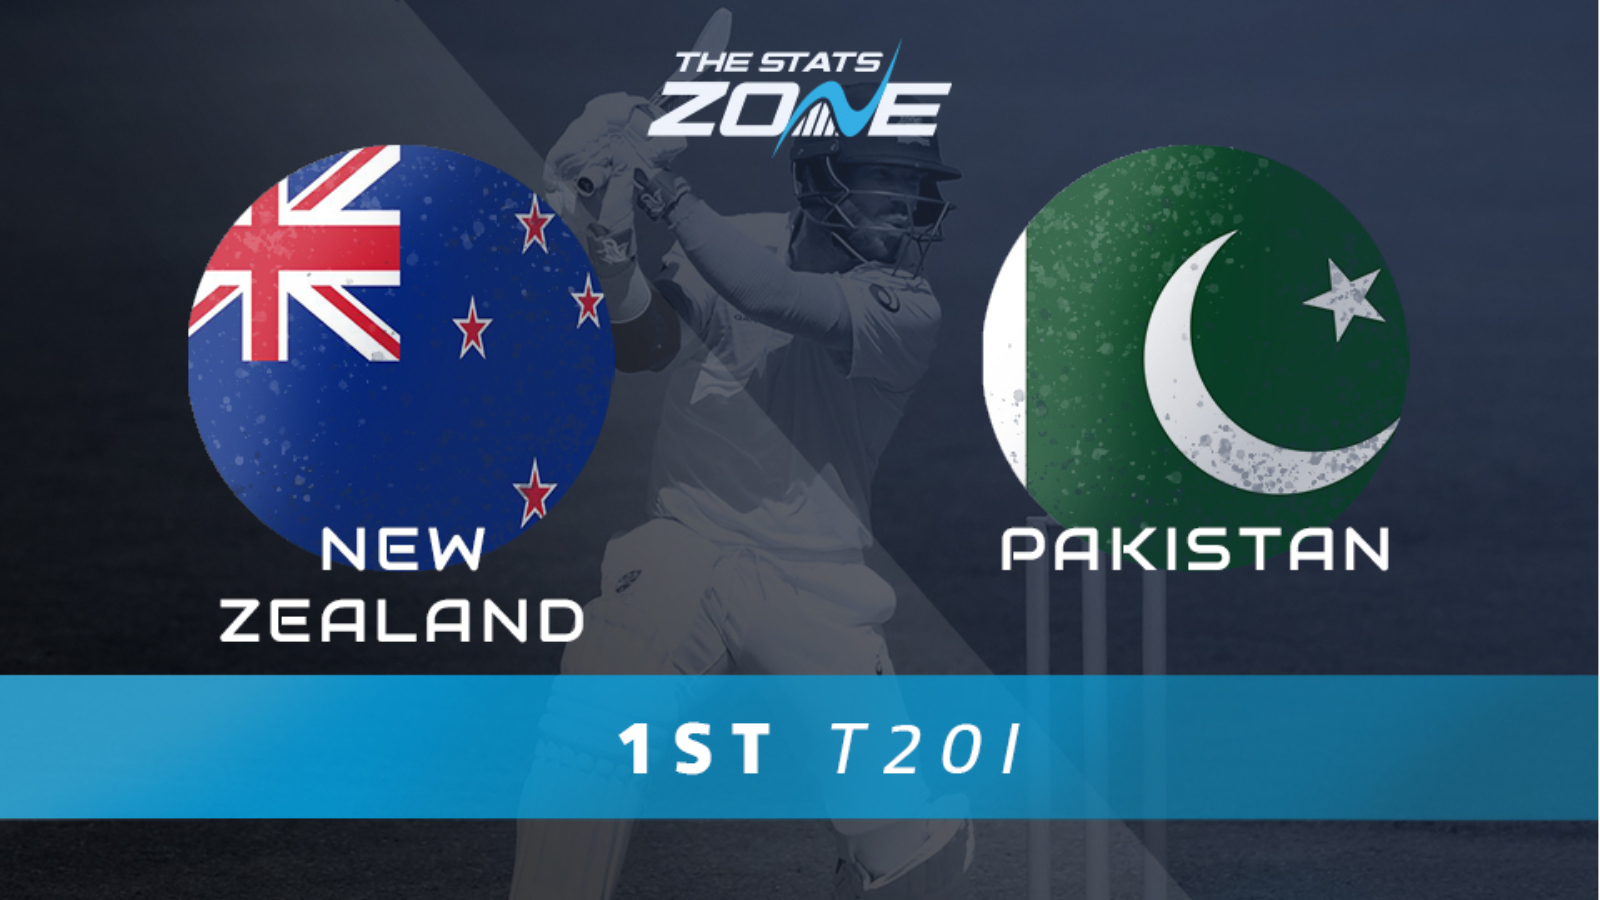 Pakistan betting score 1st t20 2021 interception touchdown packers seahawks betting